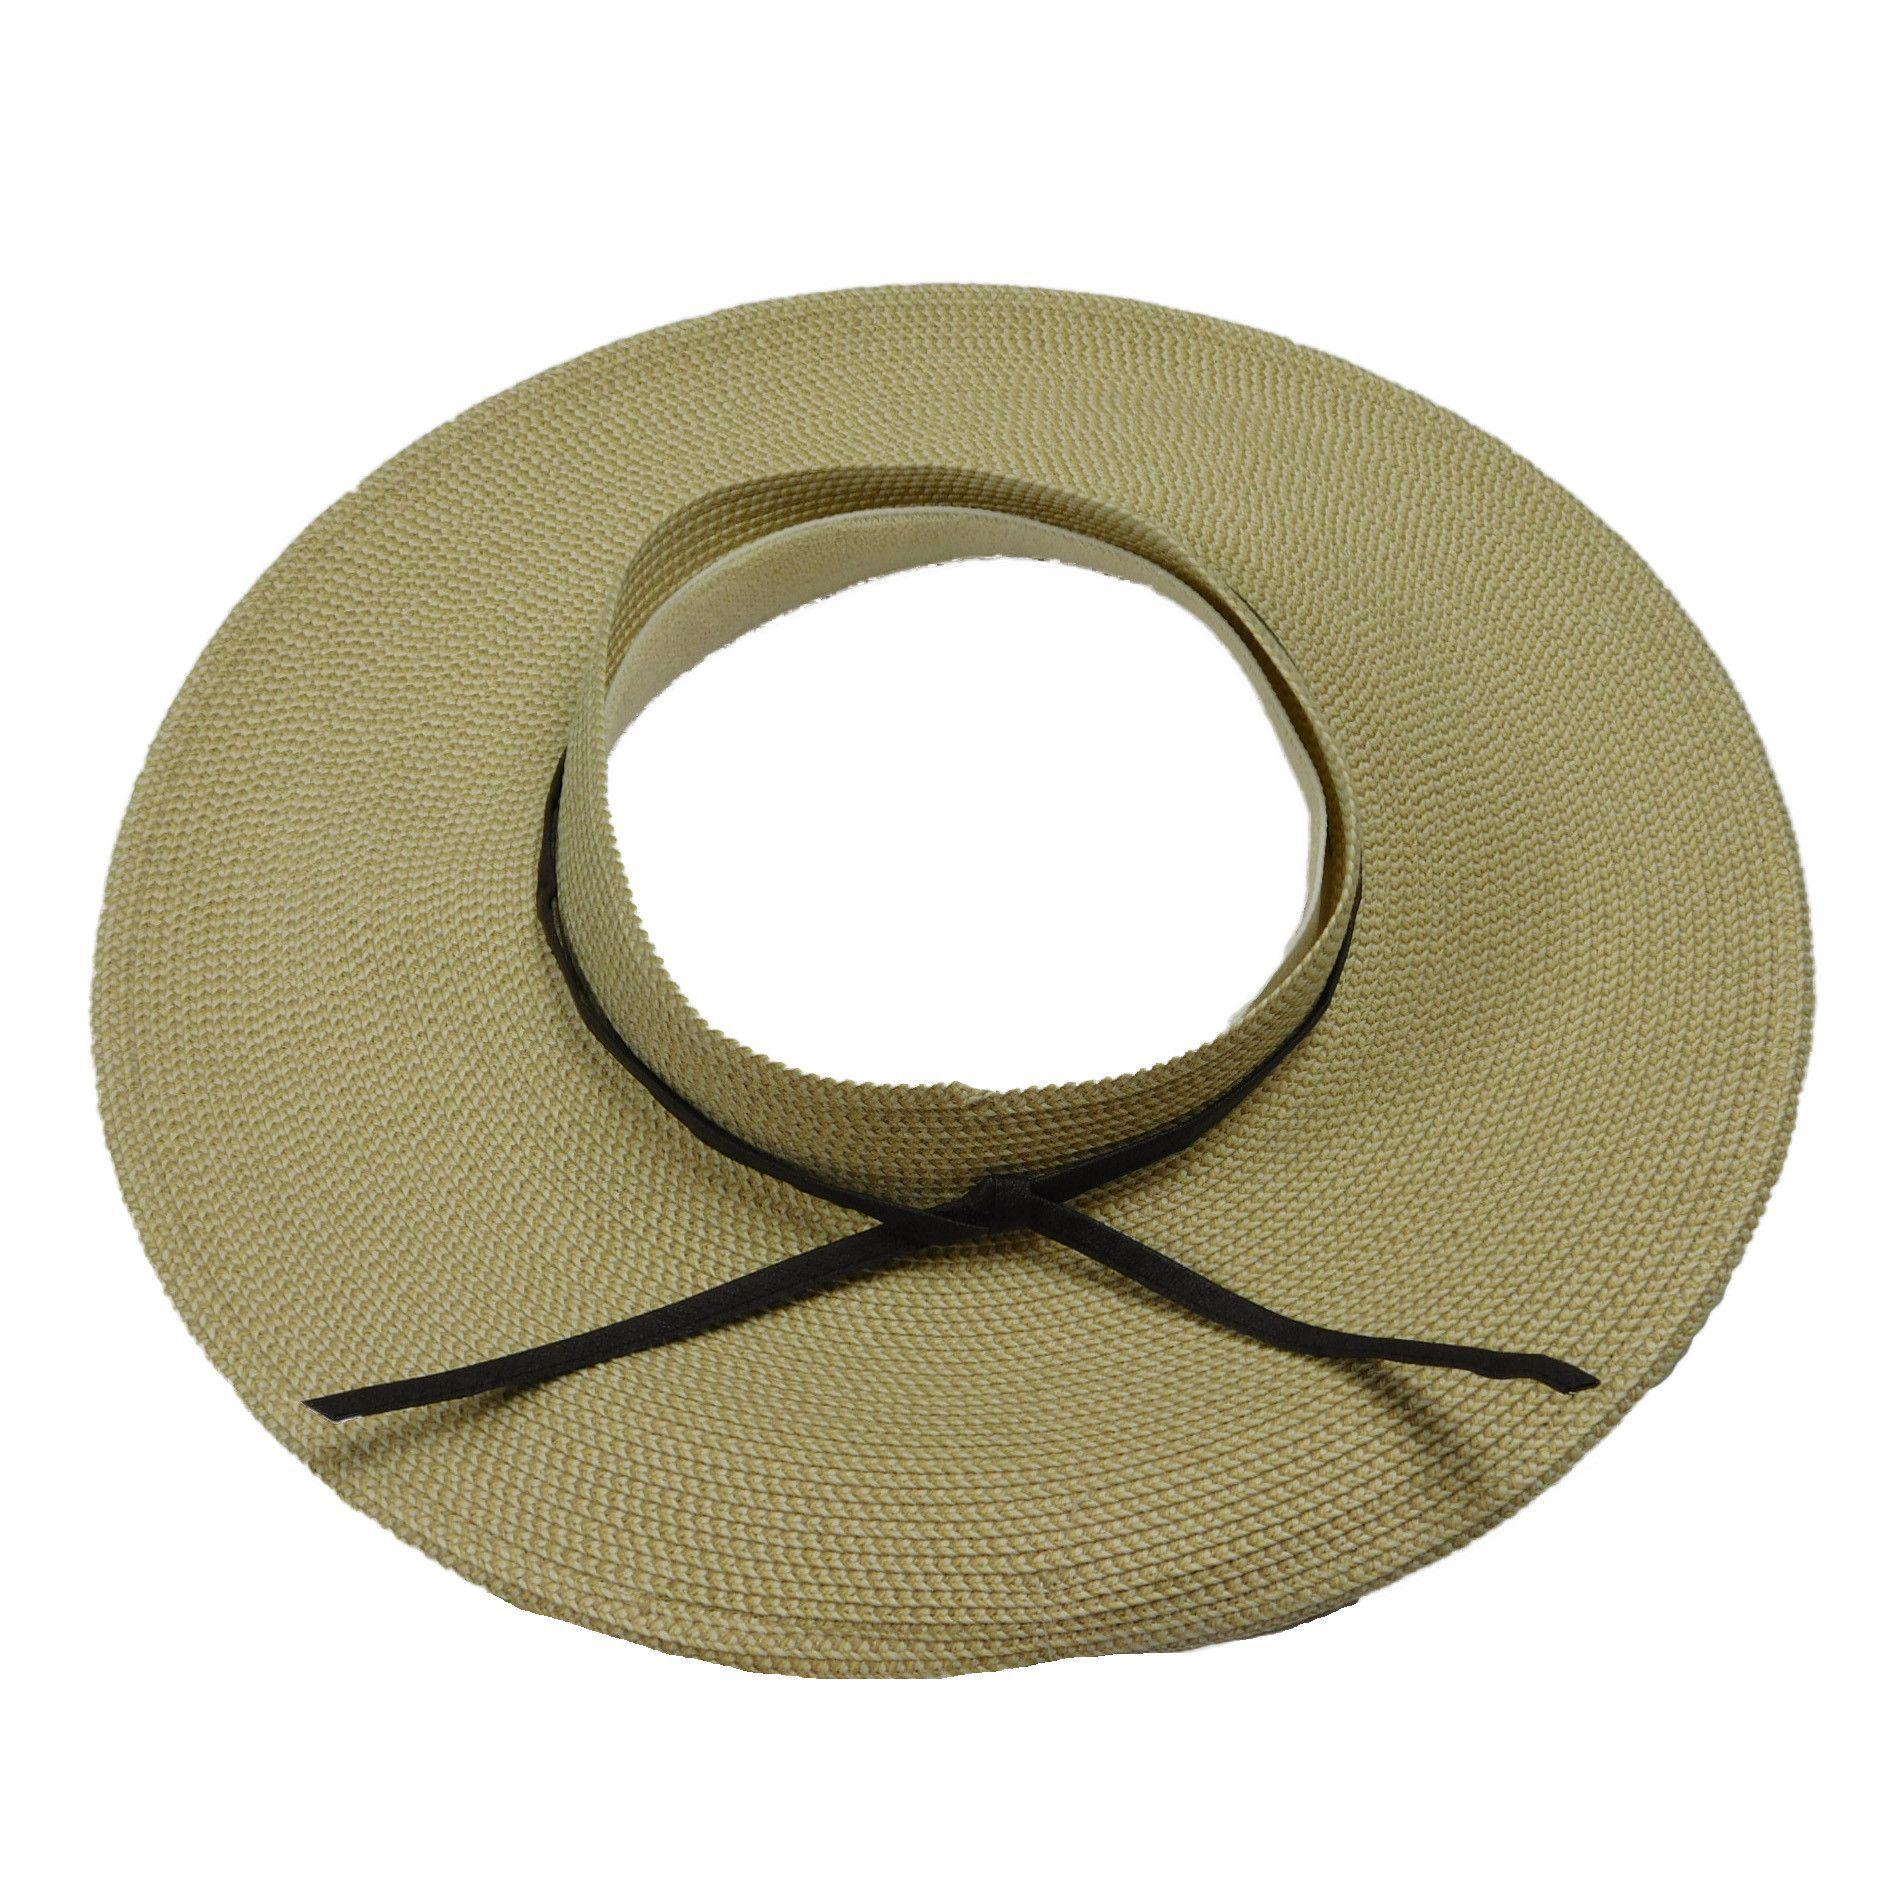 Crownless Sun Visor Hat By Jeanne Simmons Sun Visor Hat Visor Hats Sun Visors